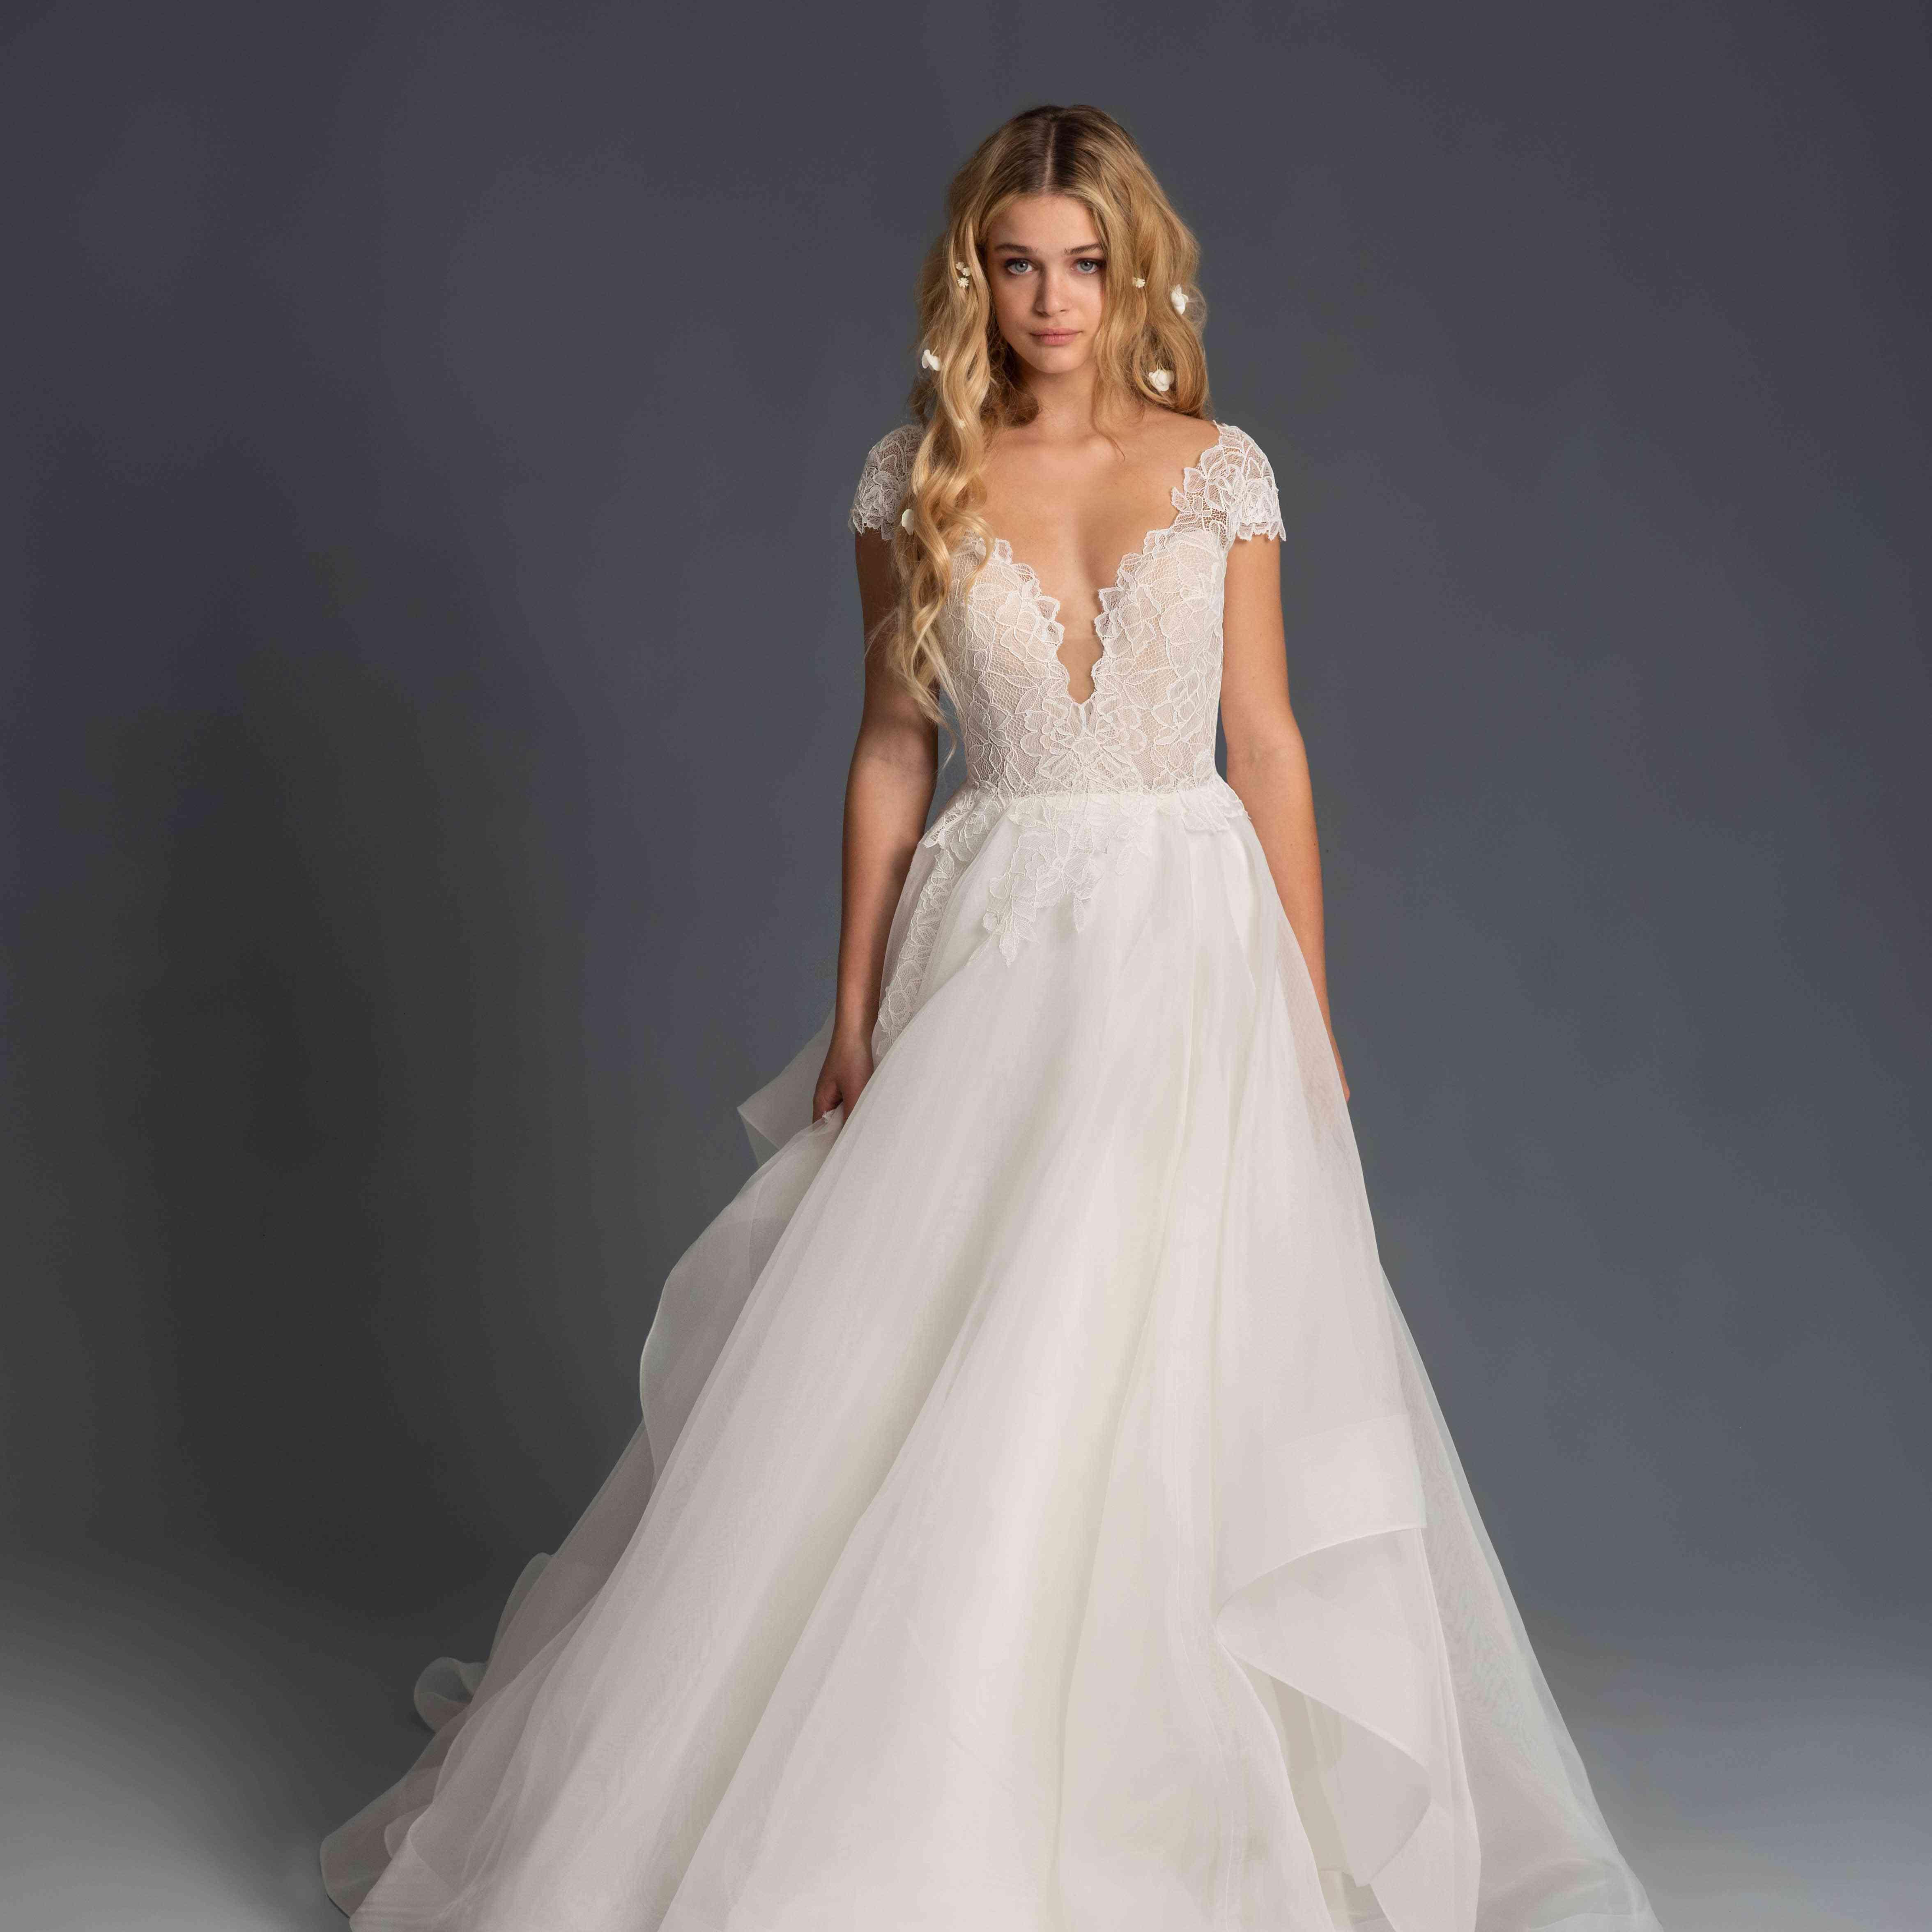 Model in cap sleeve plunging wedding dress